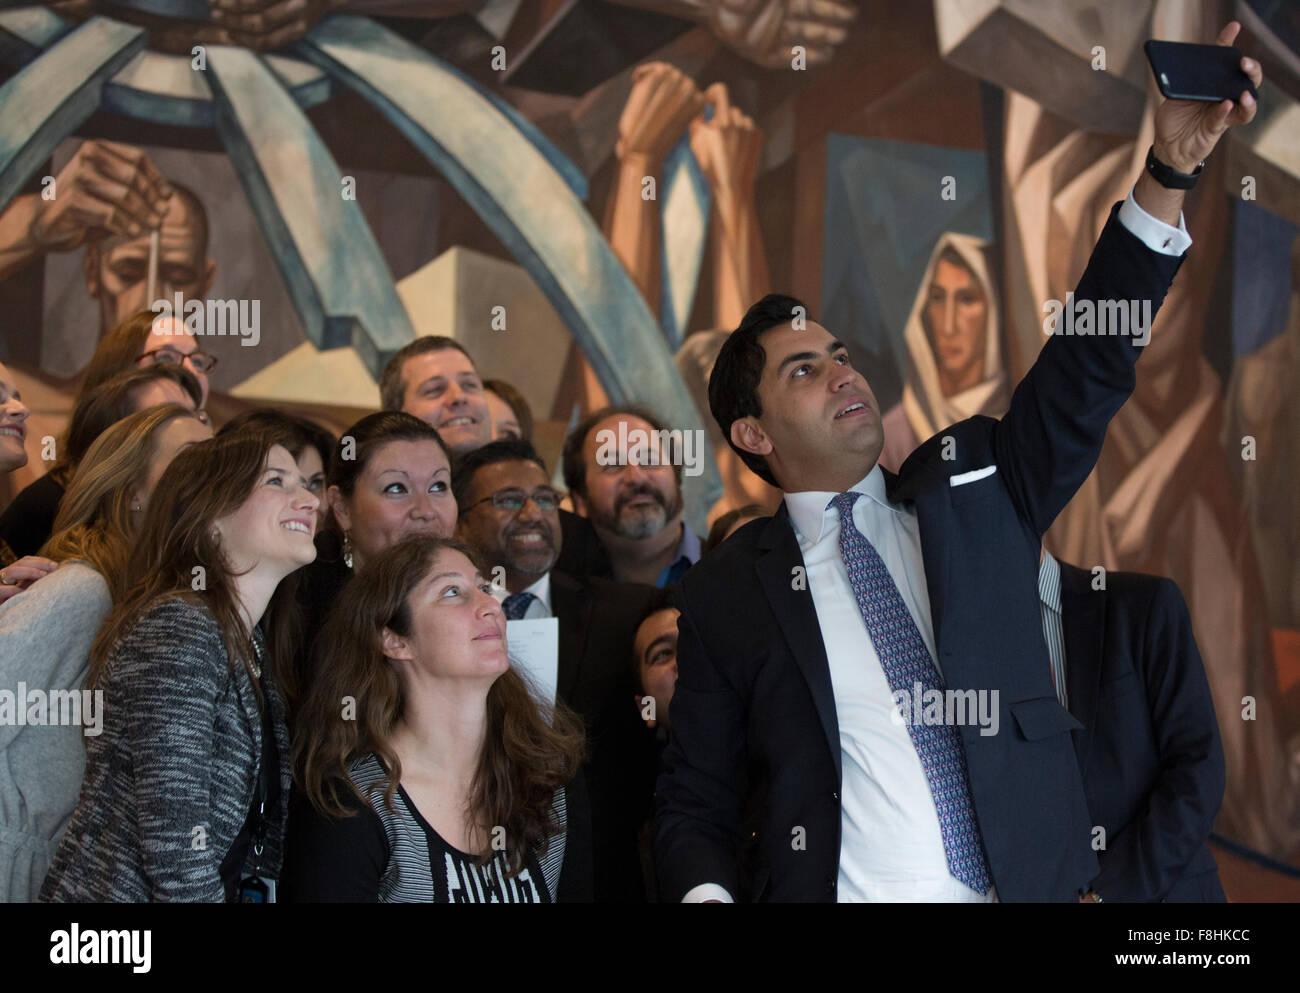 Ahmad Alhendawi ahmad alhendawi (holding cellphone), united nations stock